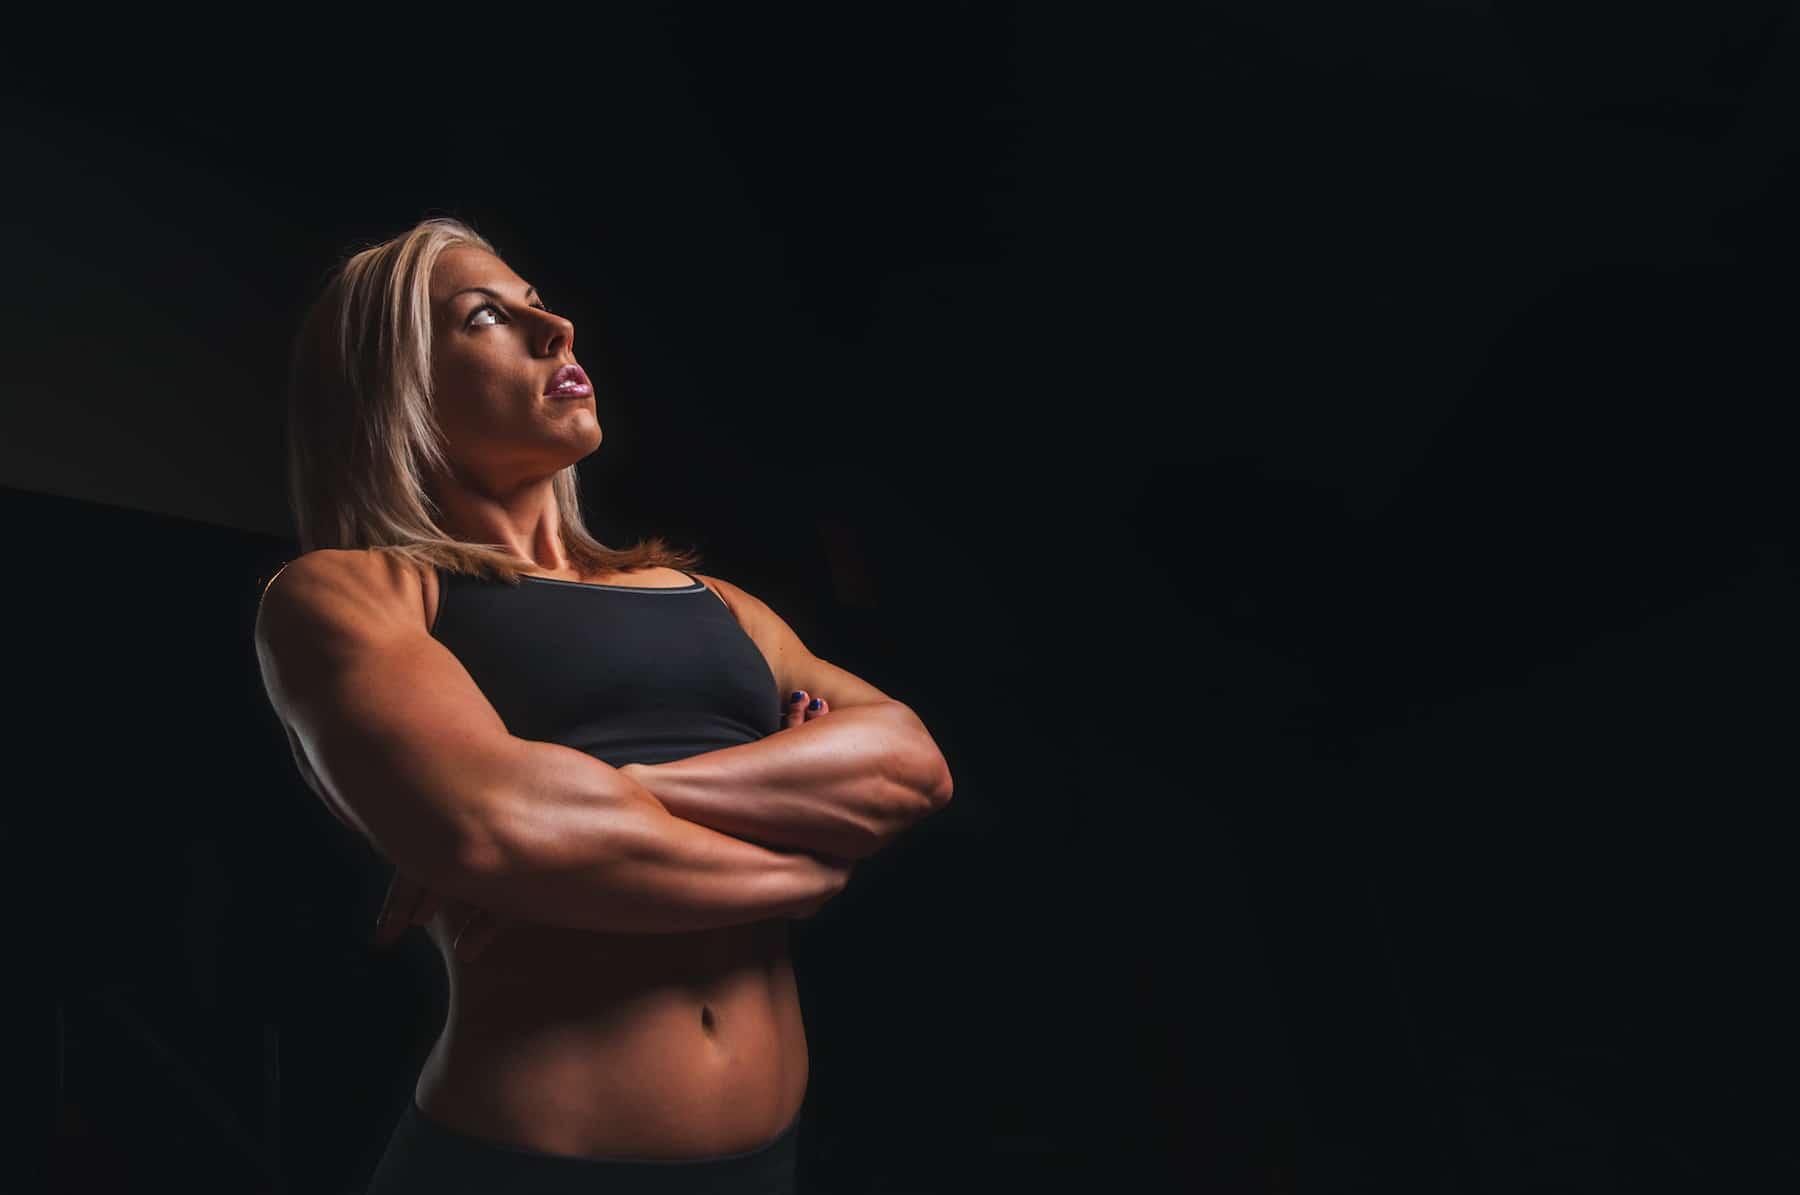 Höherer Testosteronwert Frauen Männer